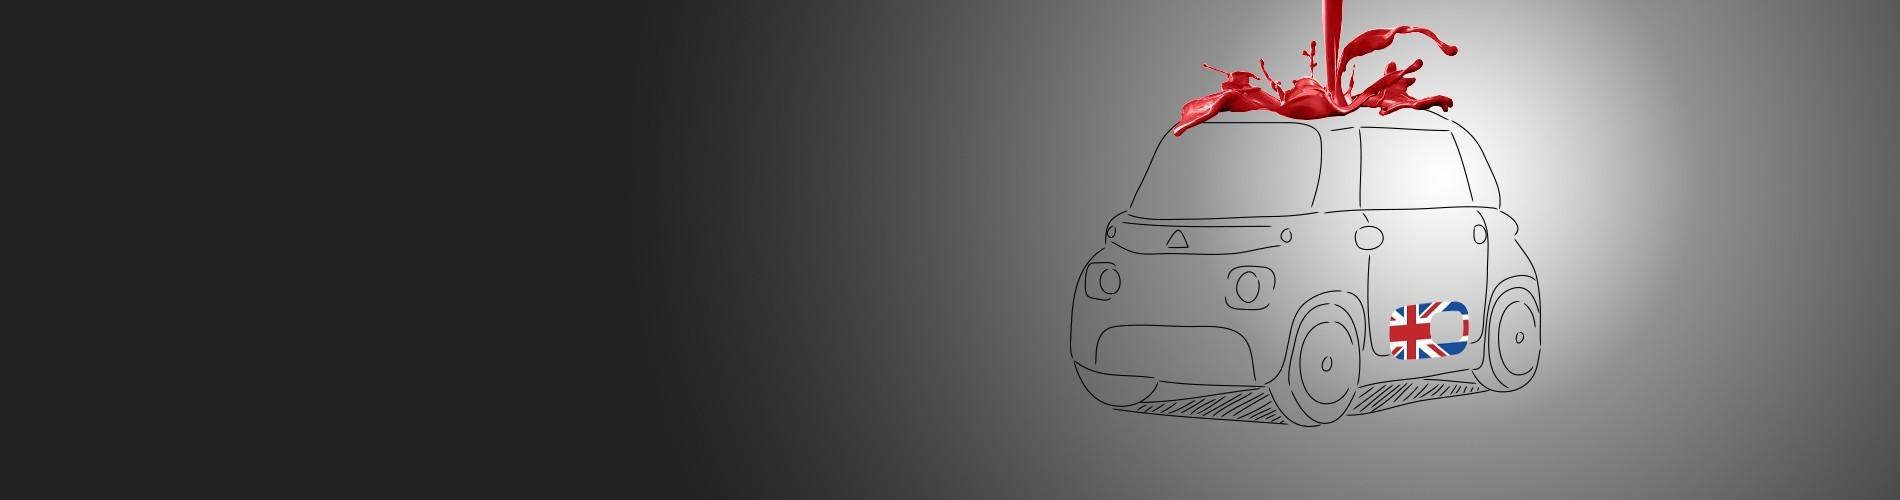 Stickers Citroën AMI - My Beautiful Car